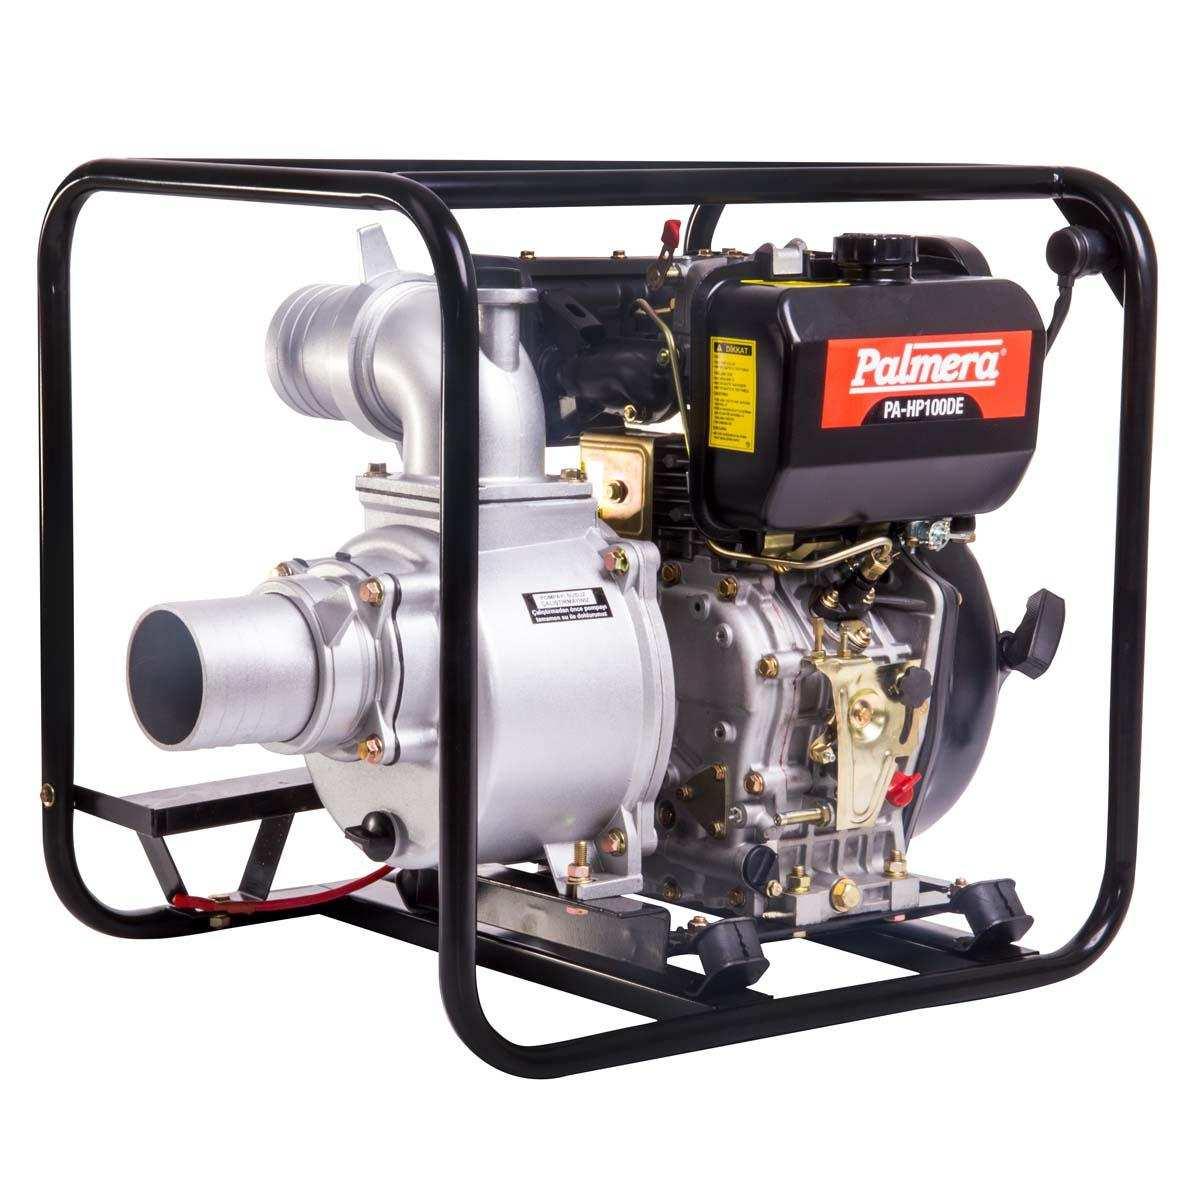 Palmera HP100DE Dizel Marşlı Su Motoru 4